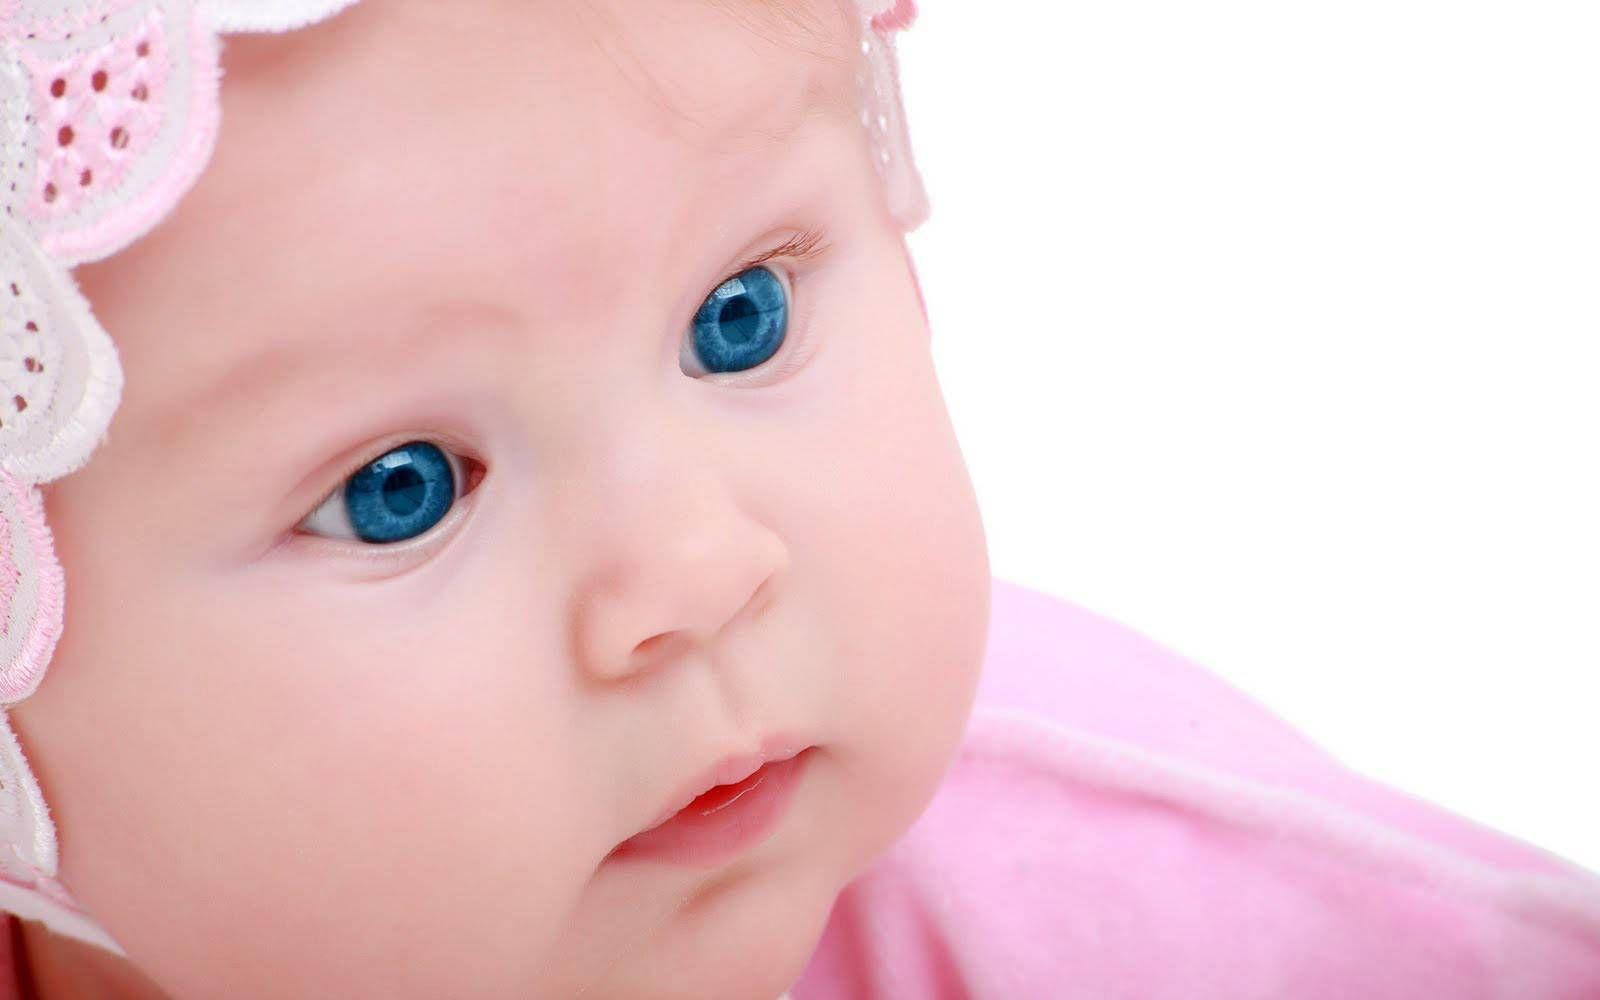 Fisher Price Power Wheels Cute Baby Girl Wallpaper Beautiful Baby Pictures Cute Baby Wallpaper